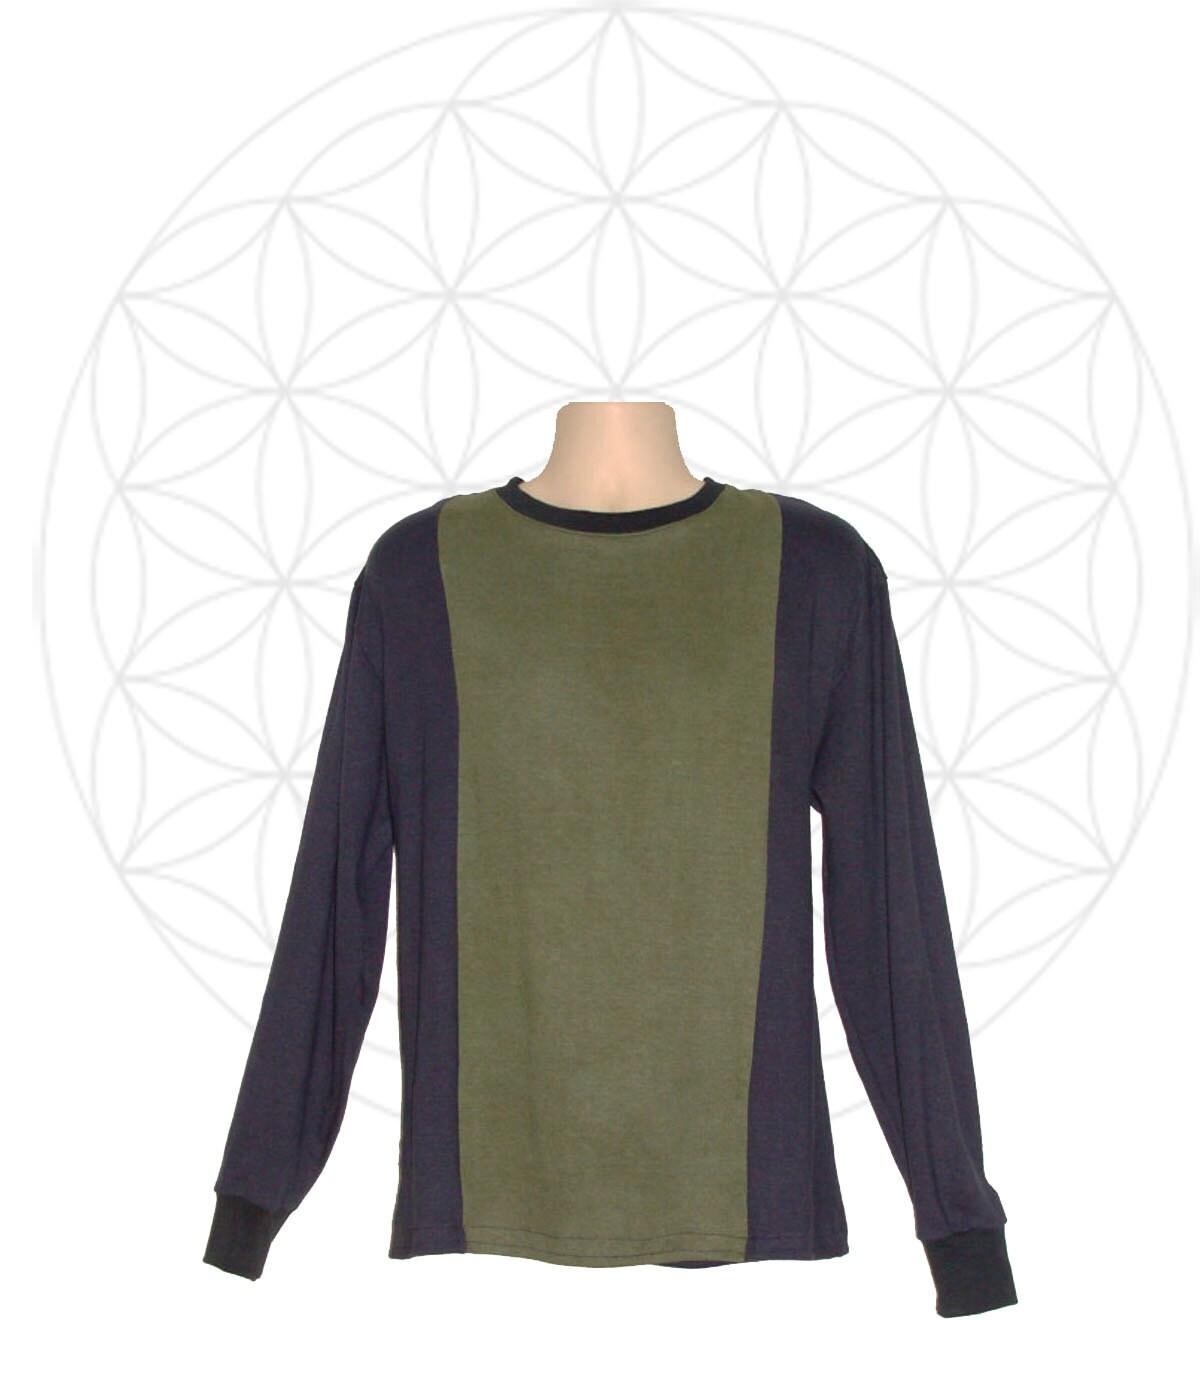 Mens Long Sleeved Shirt Handmade Organic Cotton And Hemp Etsy